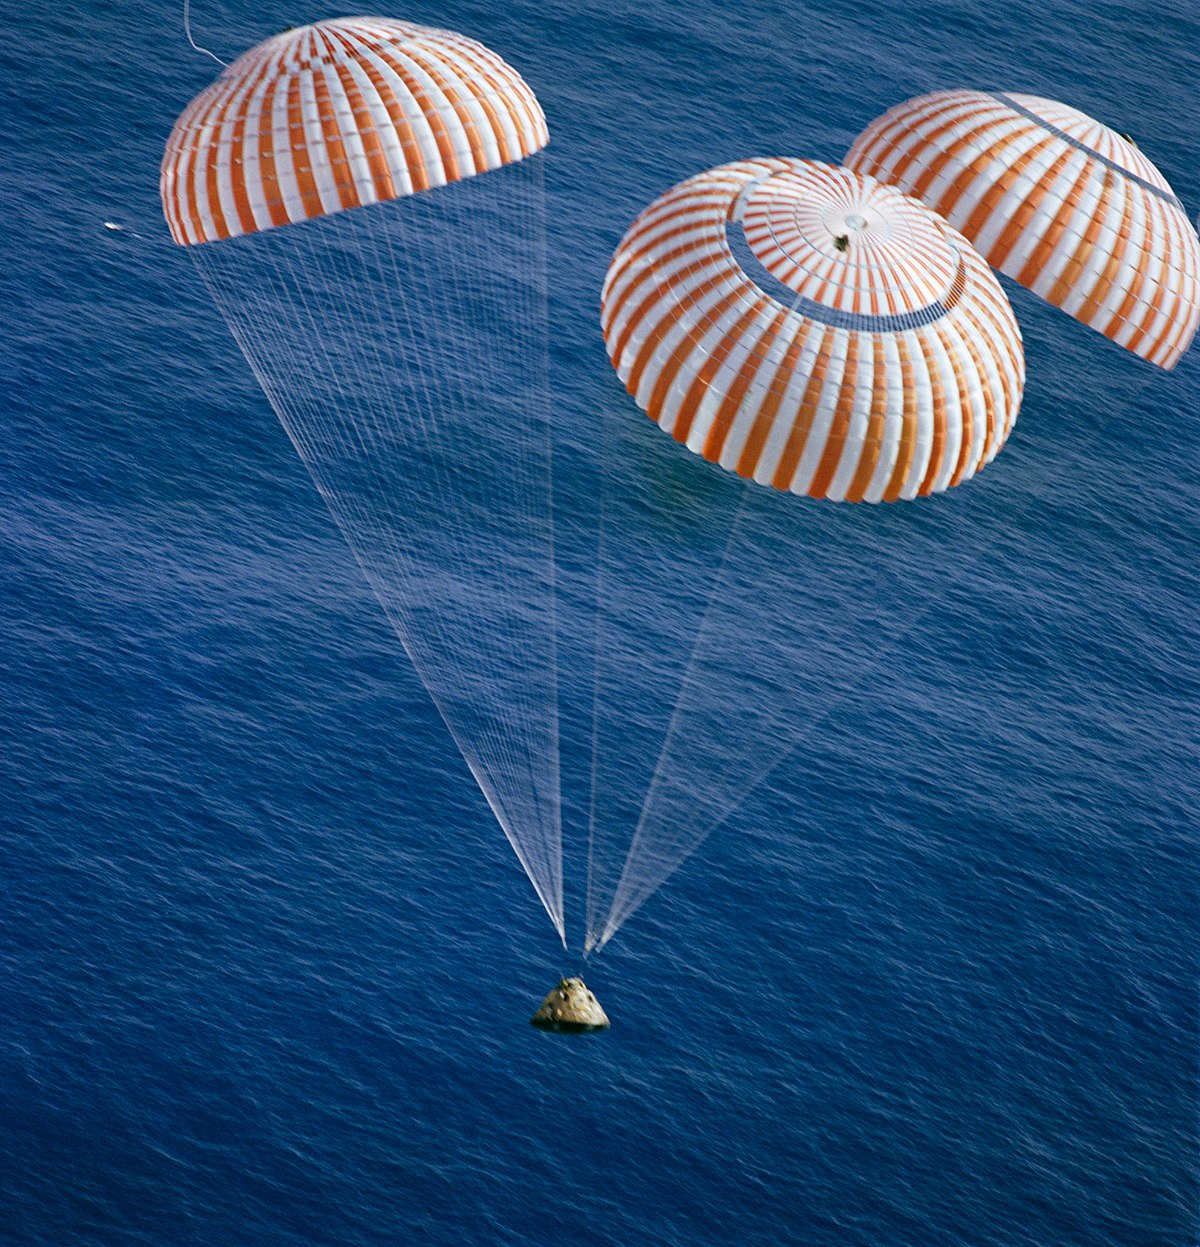 super apollo space capsule - photo #45